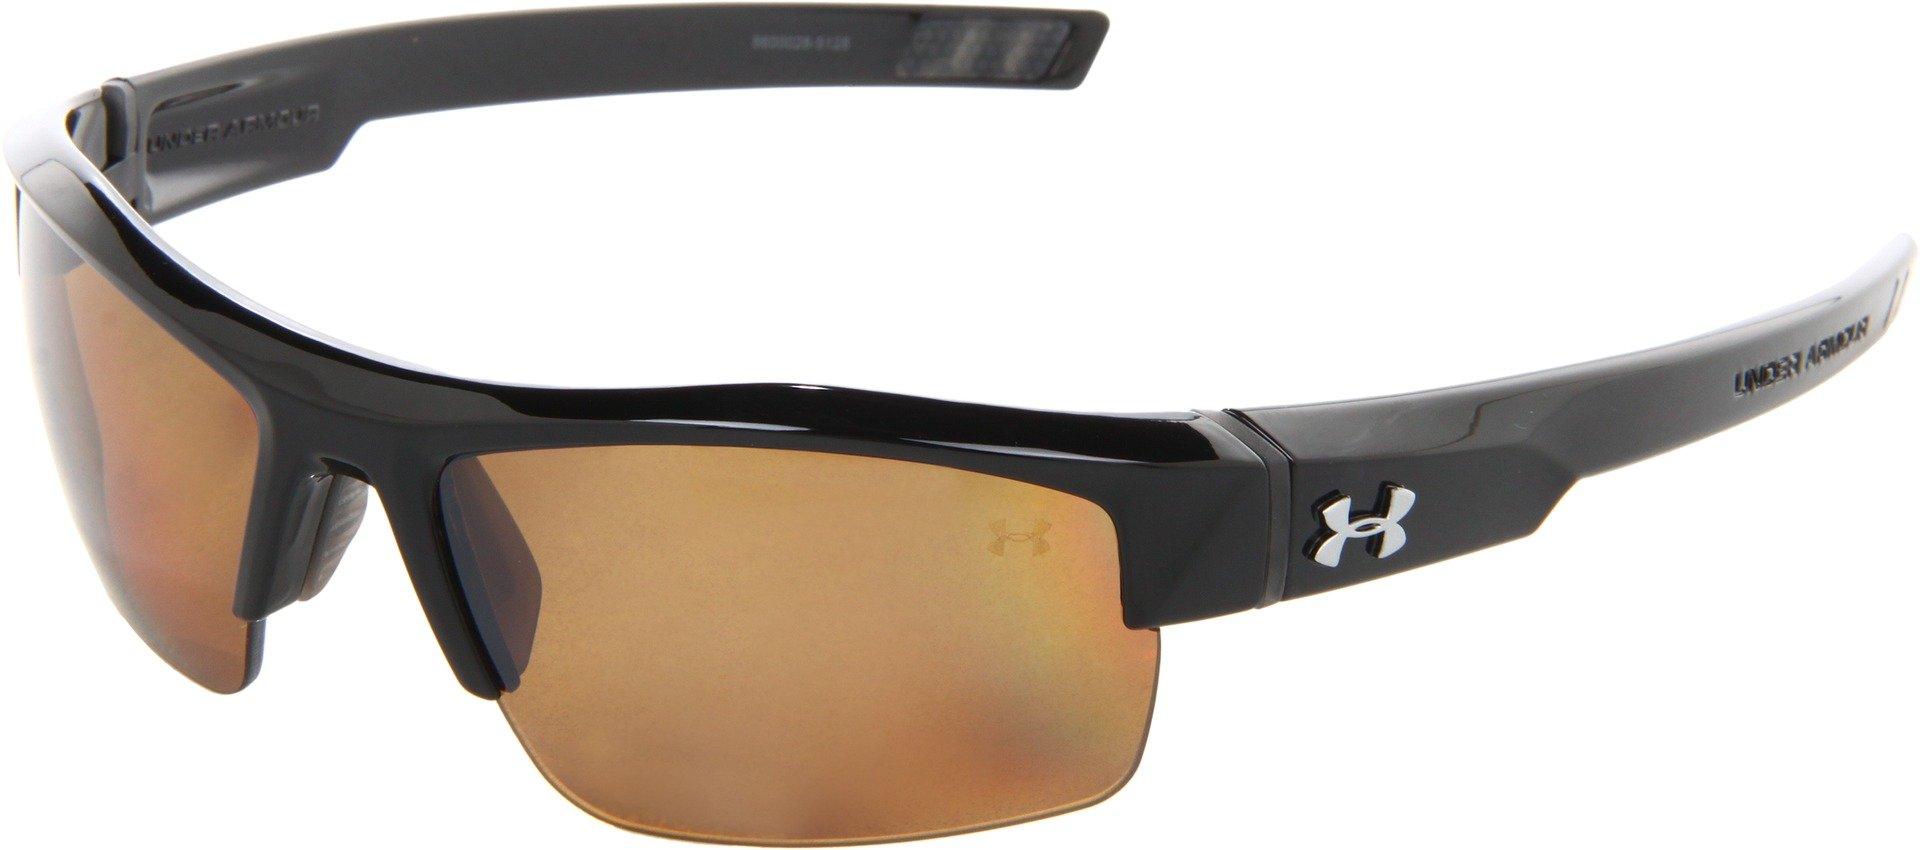 Under Armour Igniter Polarized Multiflection Sunglasses, Shiny Black Frame/Brown Lens, one size